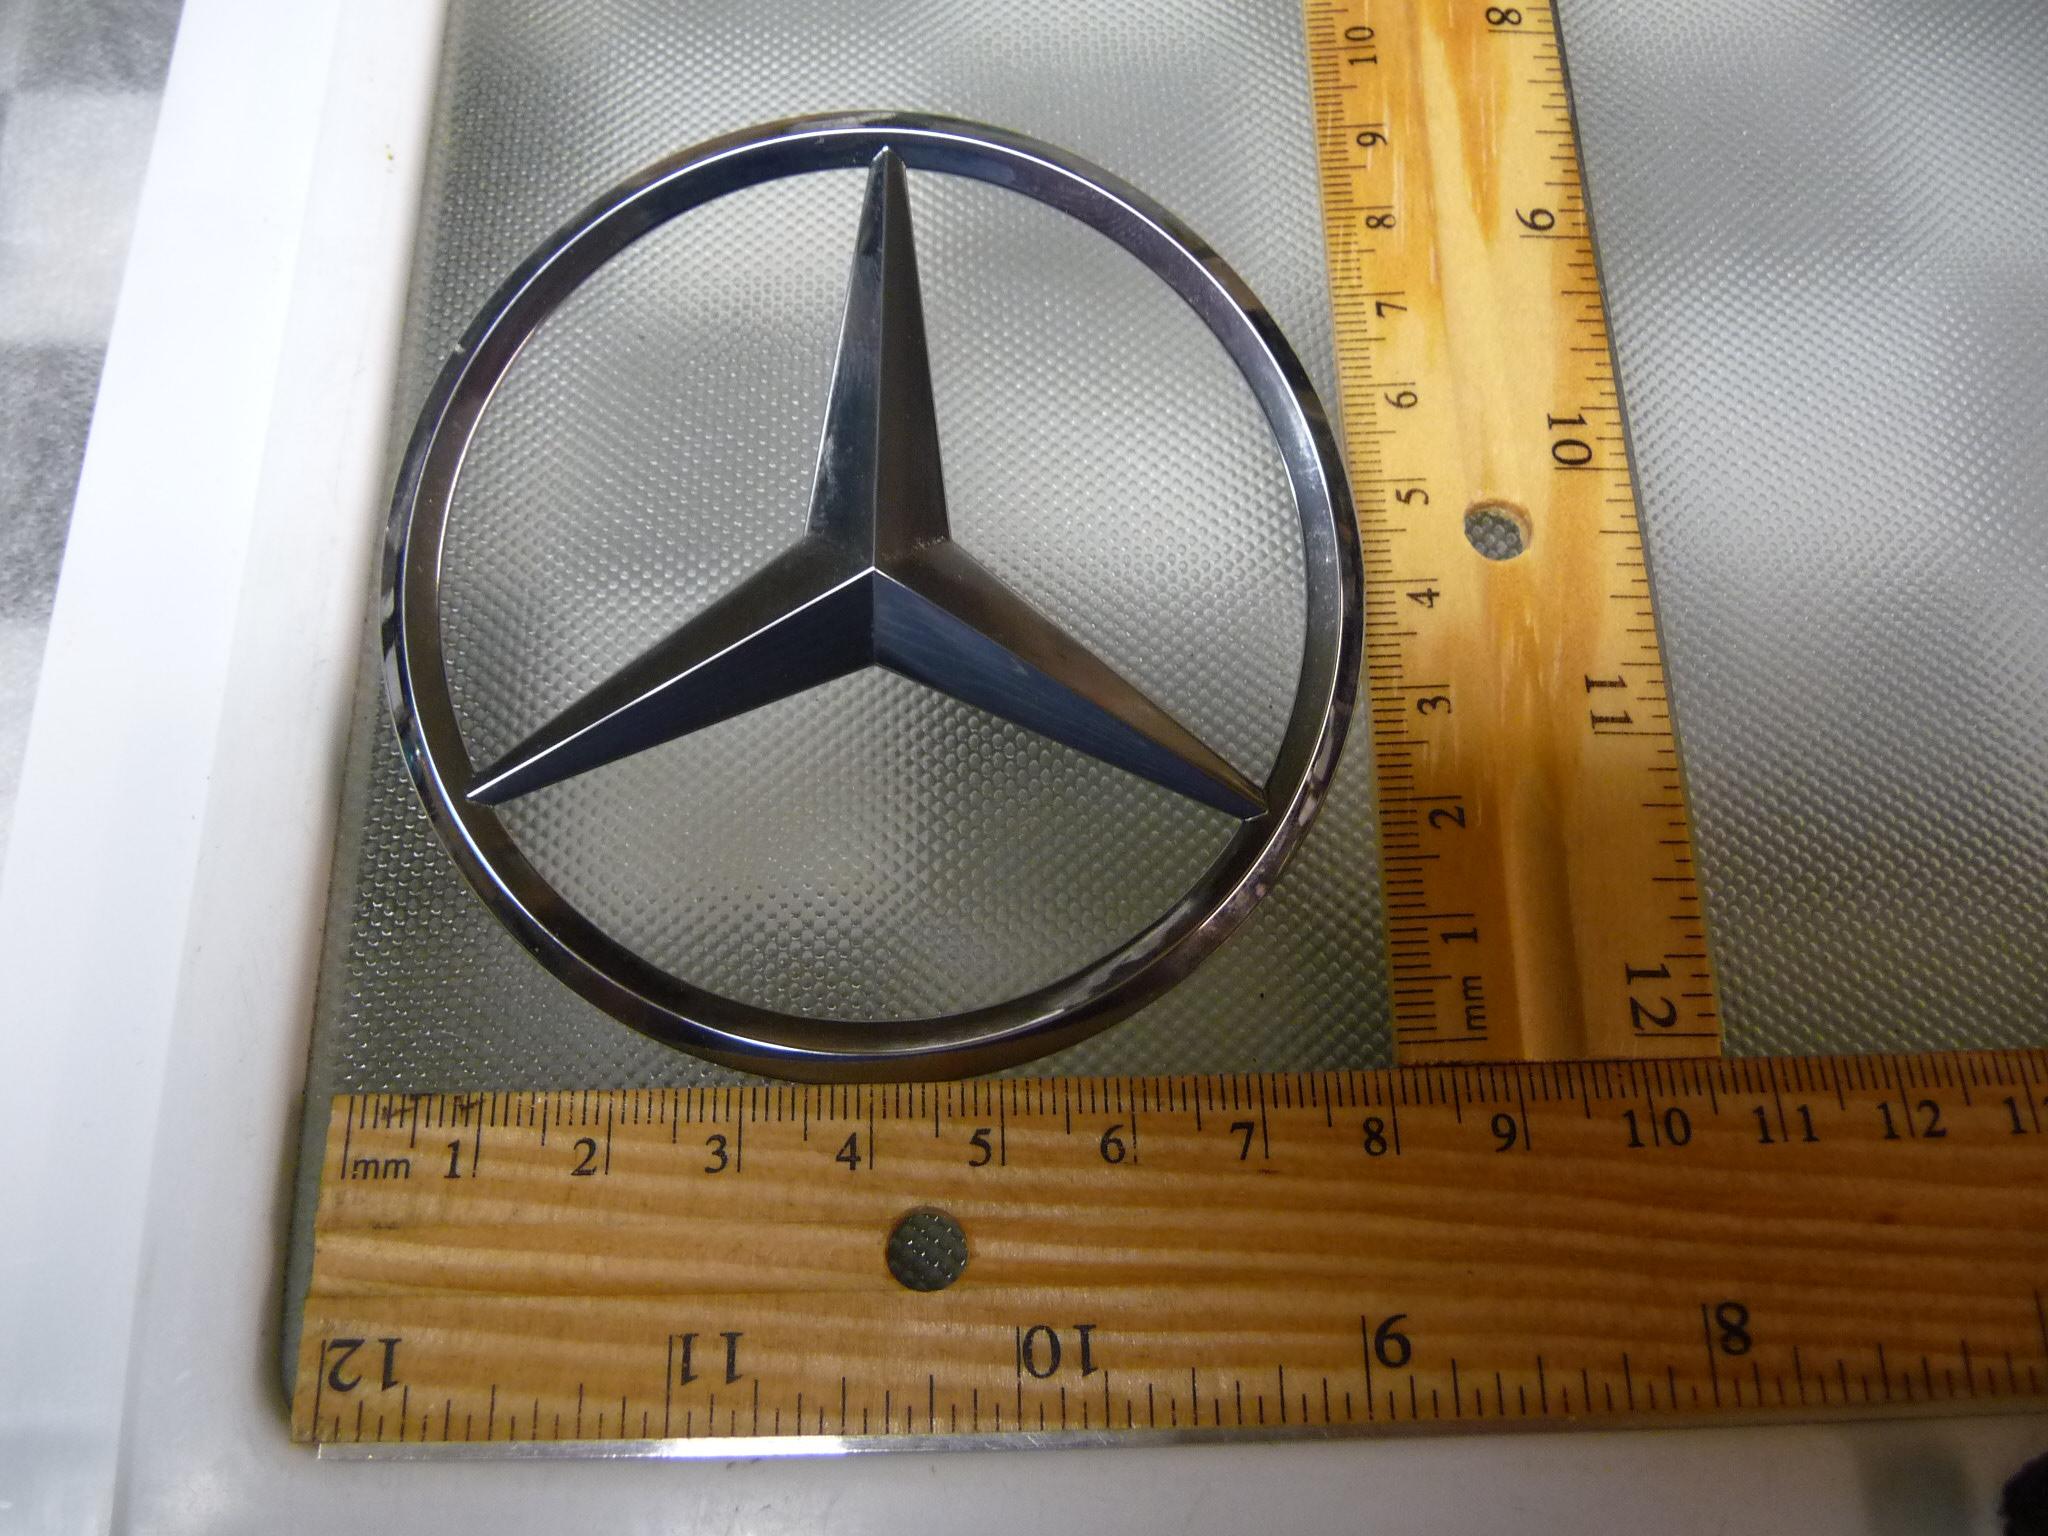 Mercedes Benz W205 C Class Trunk Lid Emblem Badge Nameplate New A2058174500 OEM